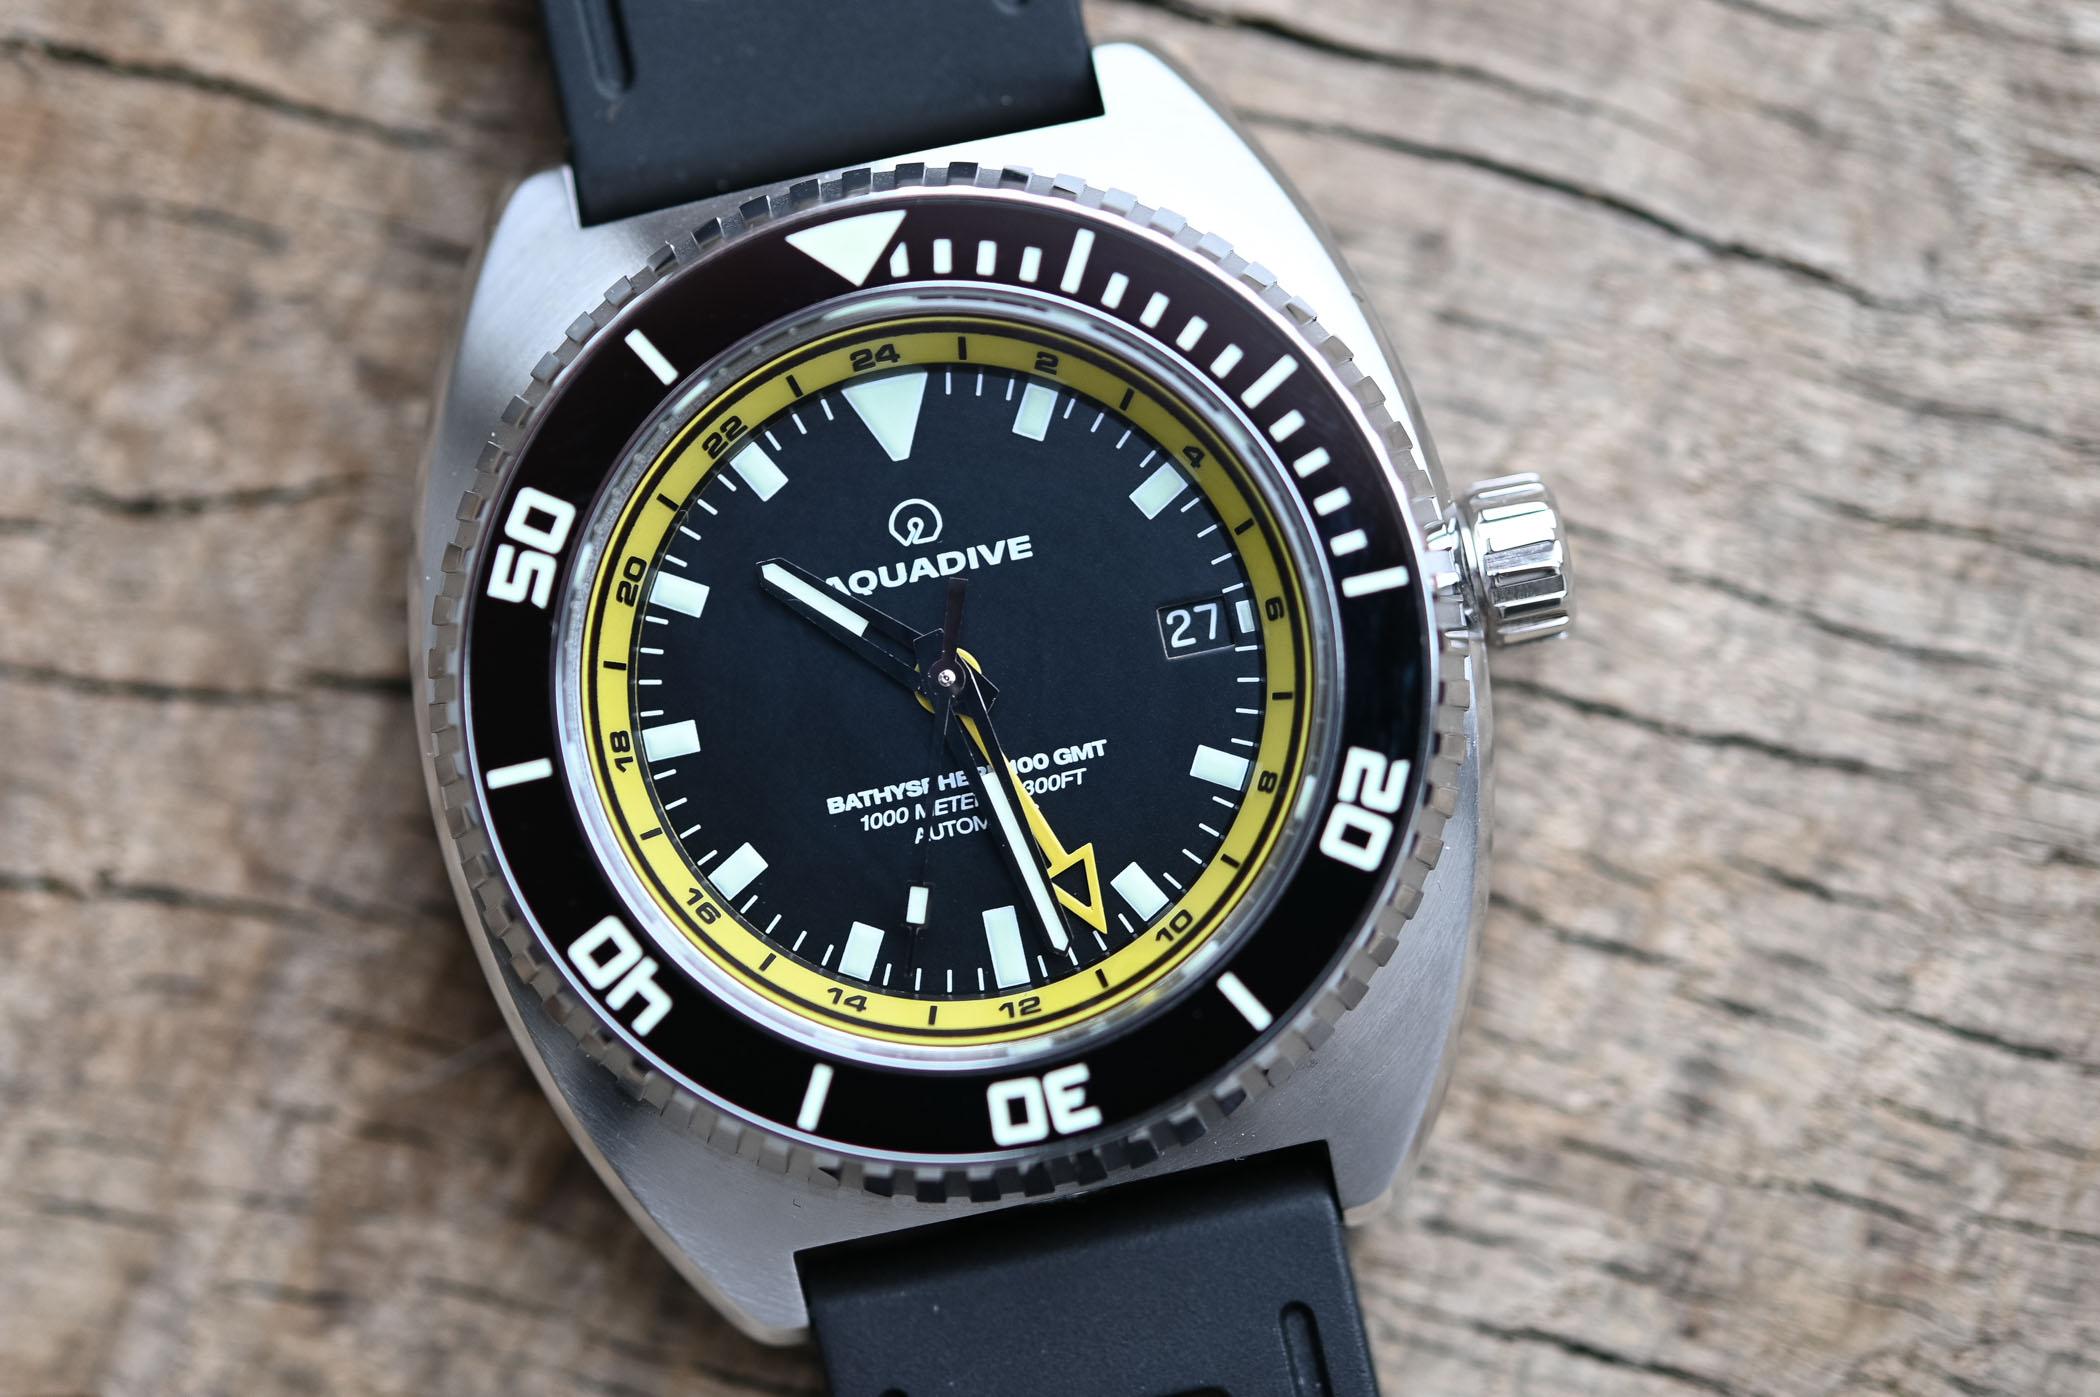 Aquadive Bathyscaphe 100 GMT